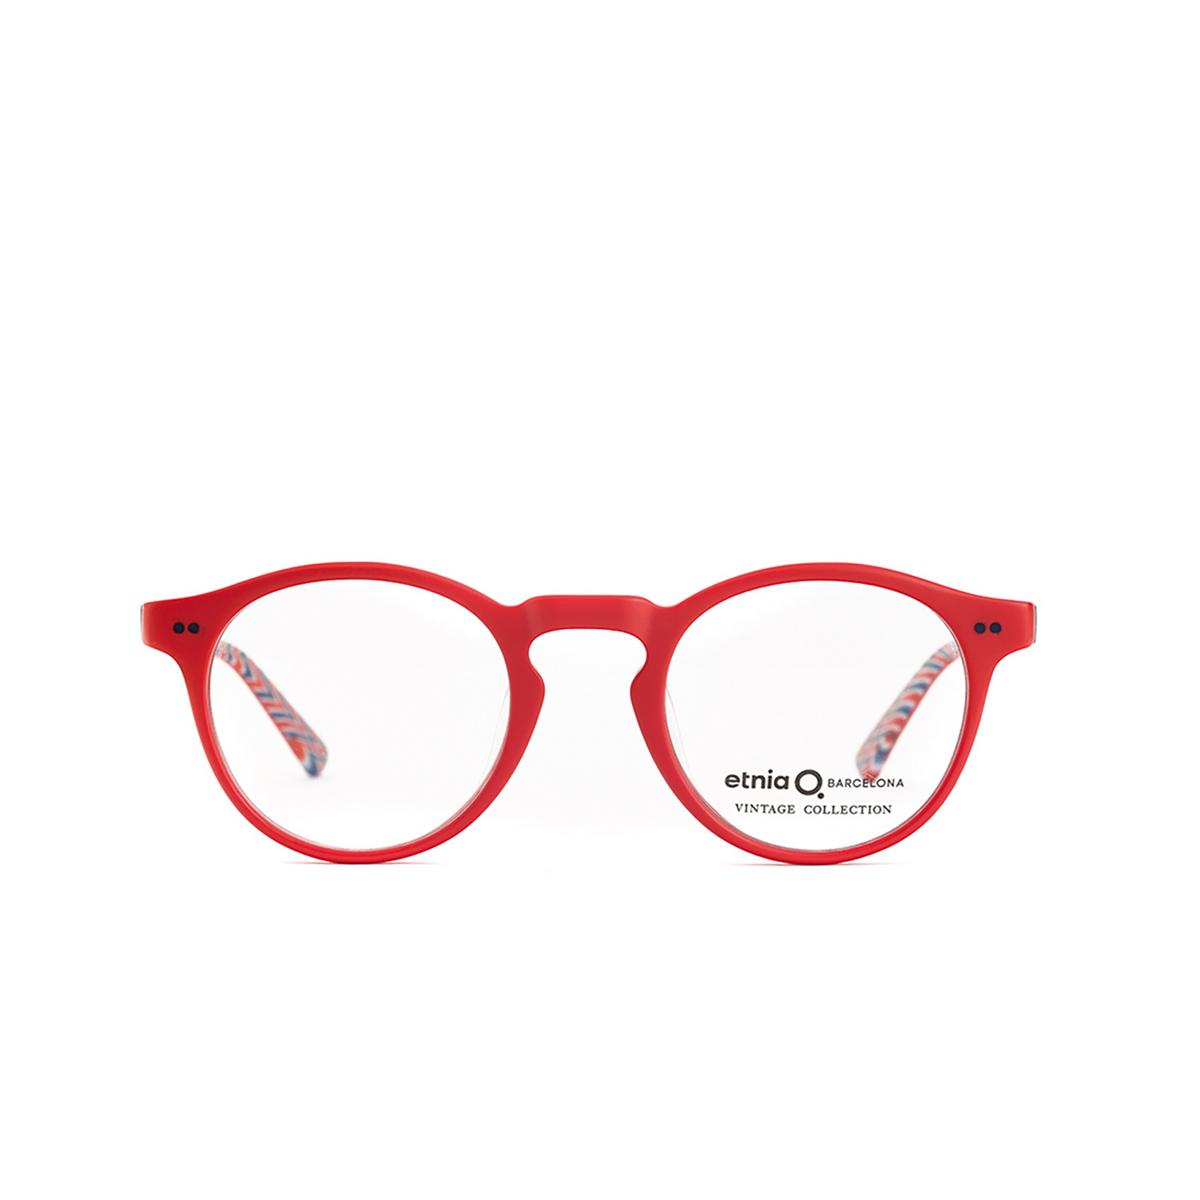 Etnia Barcelona® Round Eyeglasses: Mission District color Rdbl - front view.